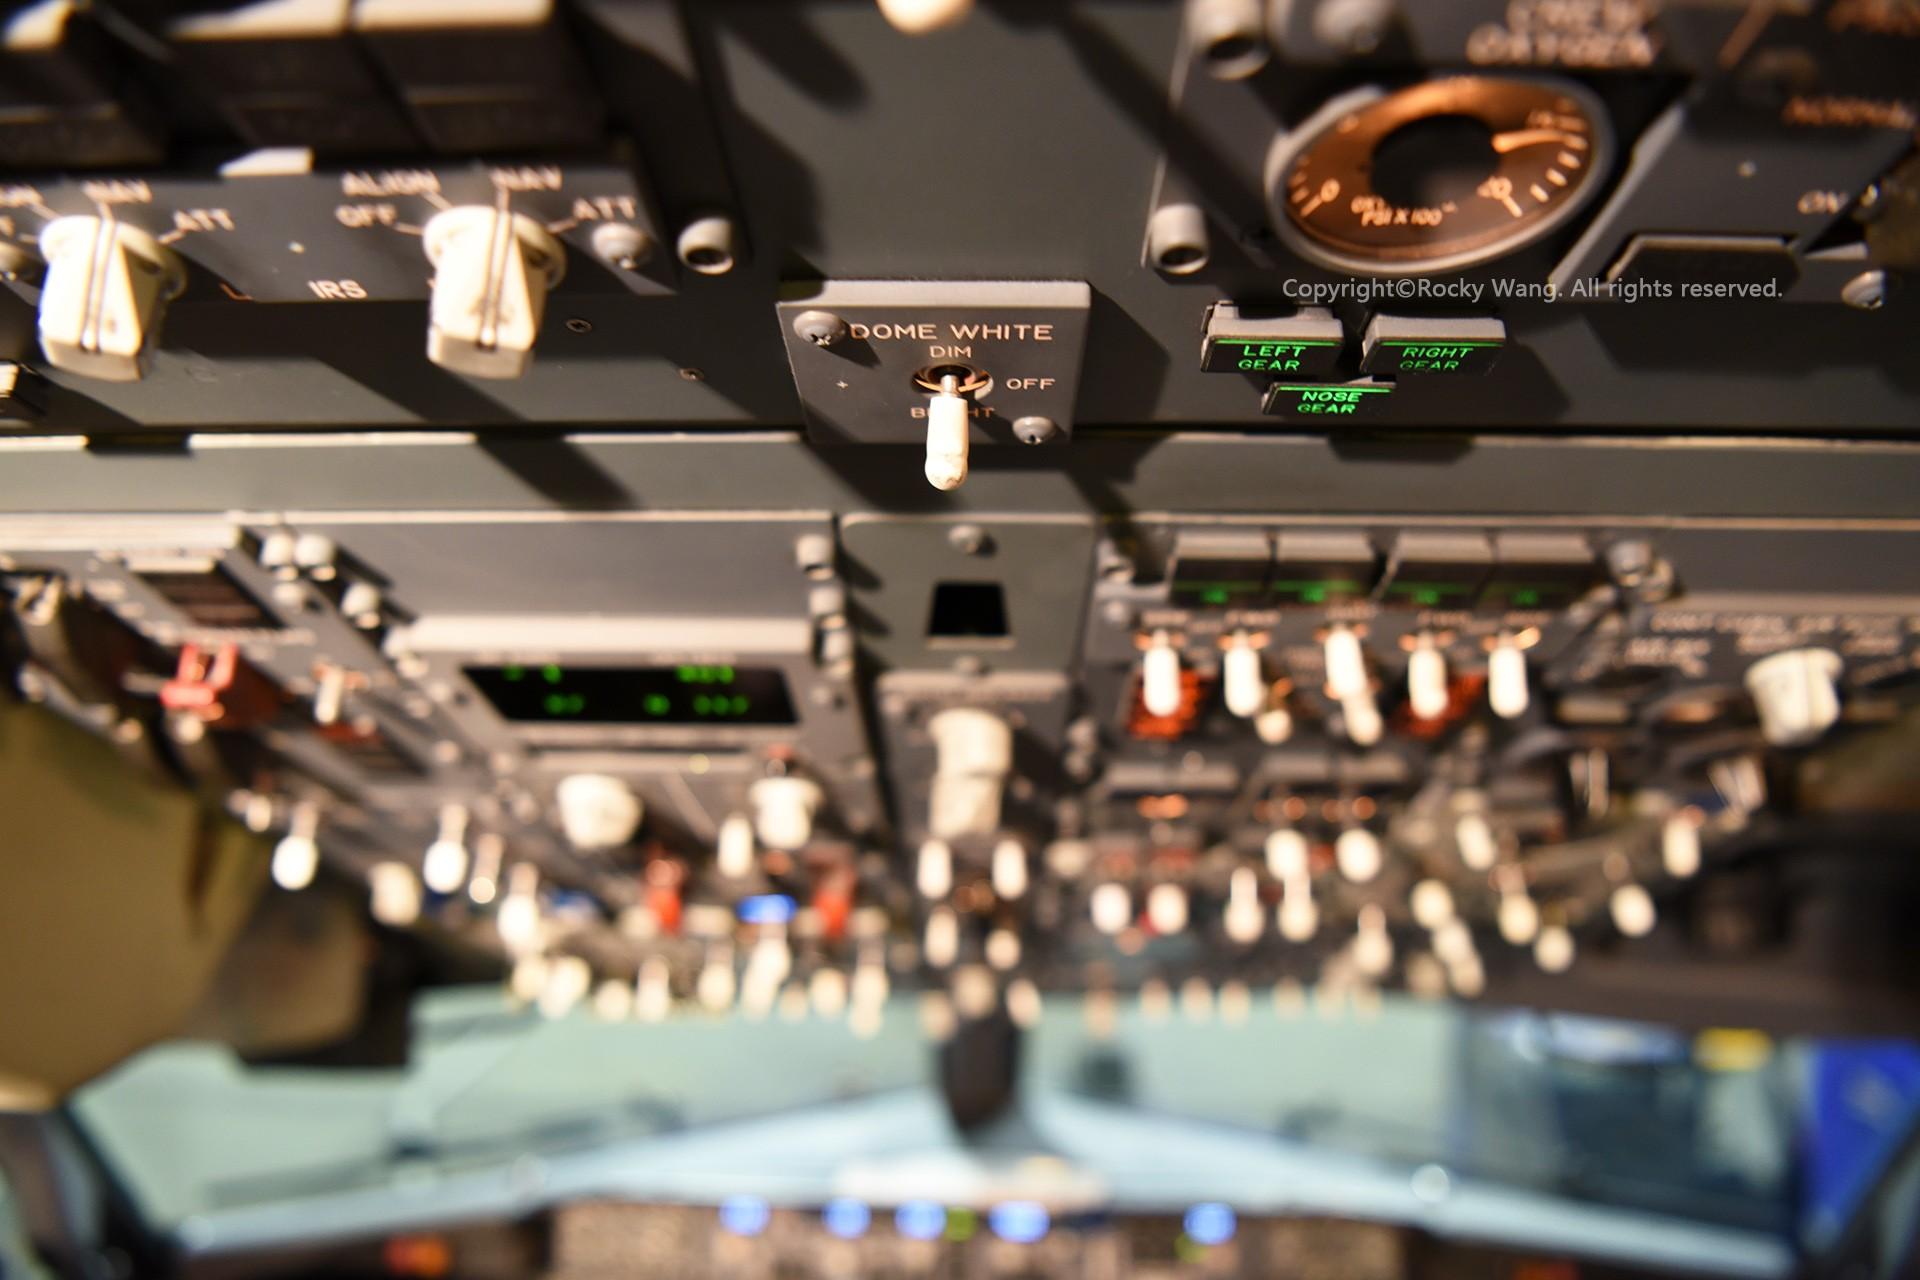 Re:[原创]简易版游记,纪念一次30段的环球飞行和一些碎碎念 BOEING 737-8H4 N8536Z Seattle-Tacoma Int'l Airport